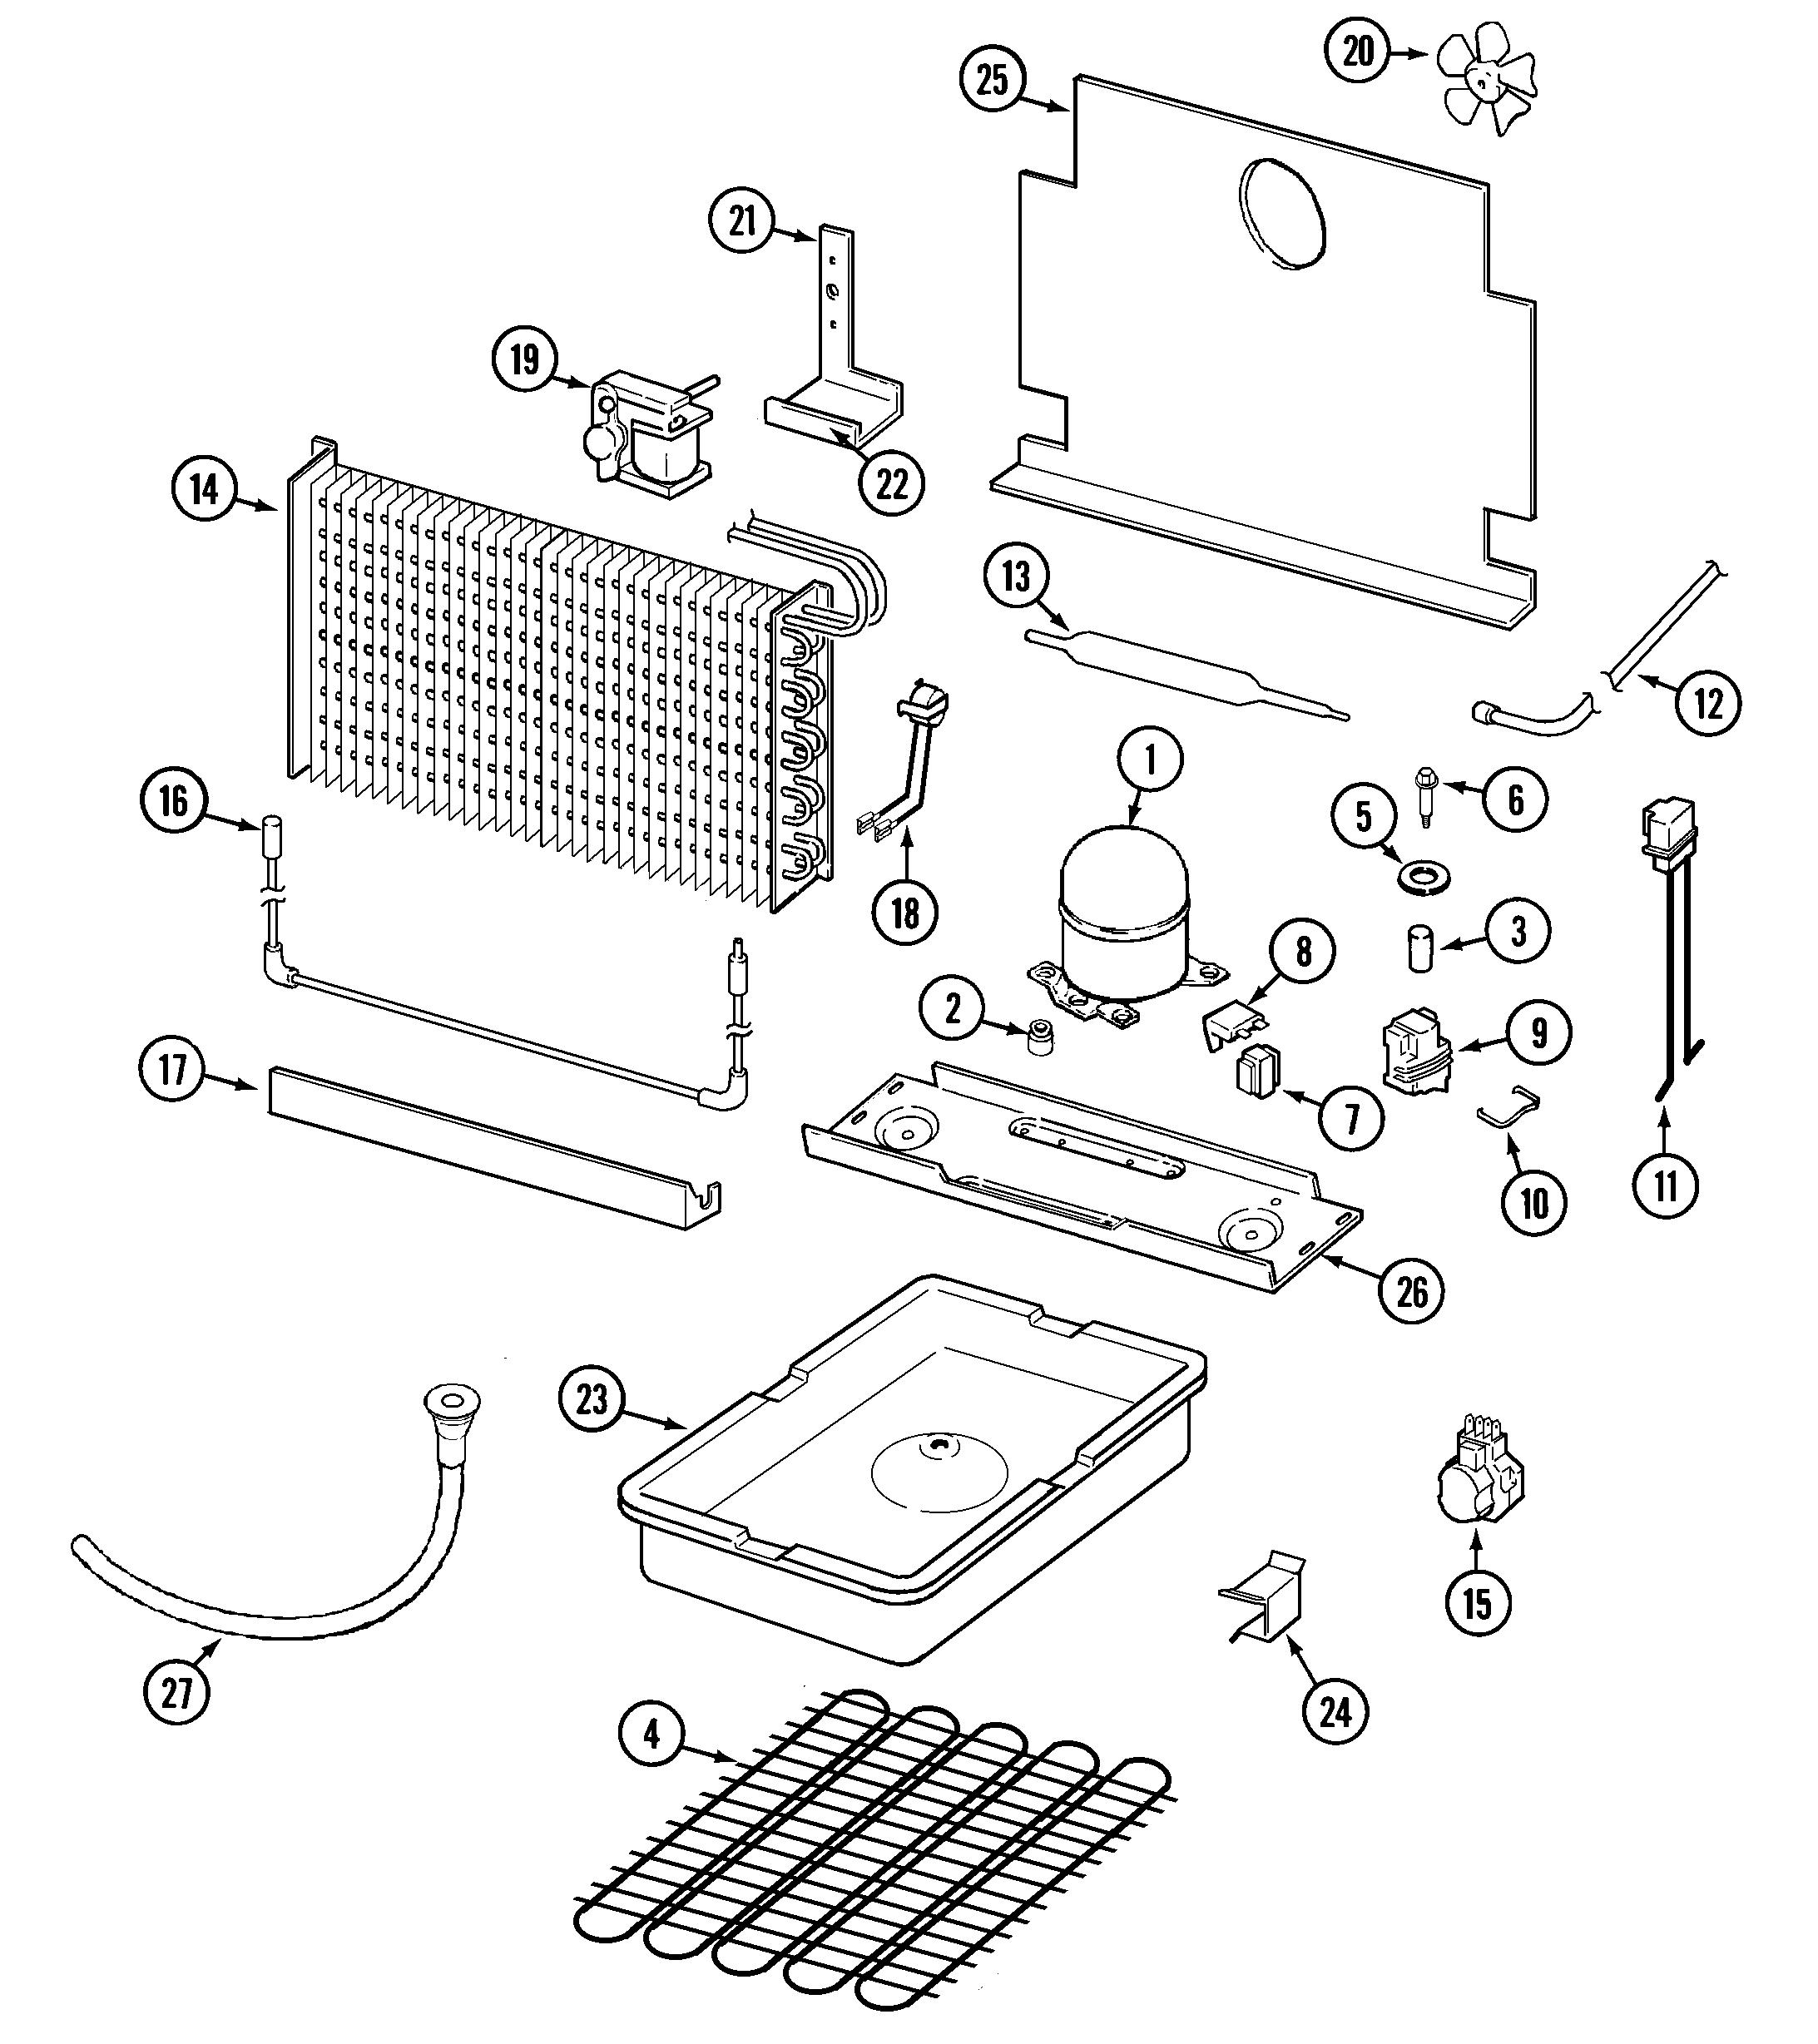 Kenmore Elite 110 Wiring Diagram Kenmore Elite 110